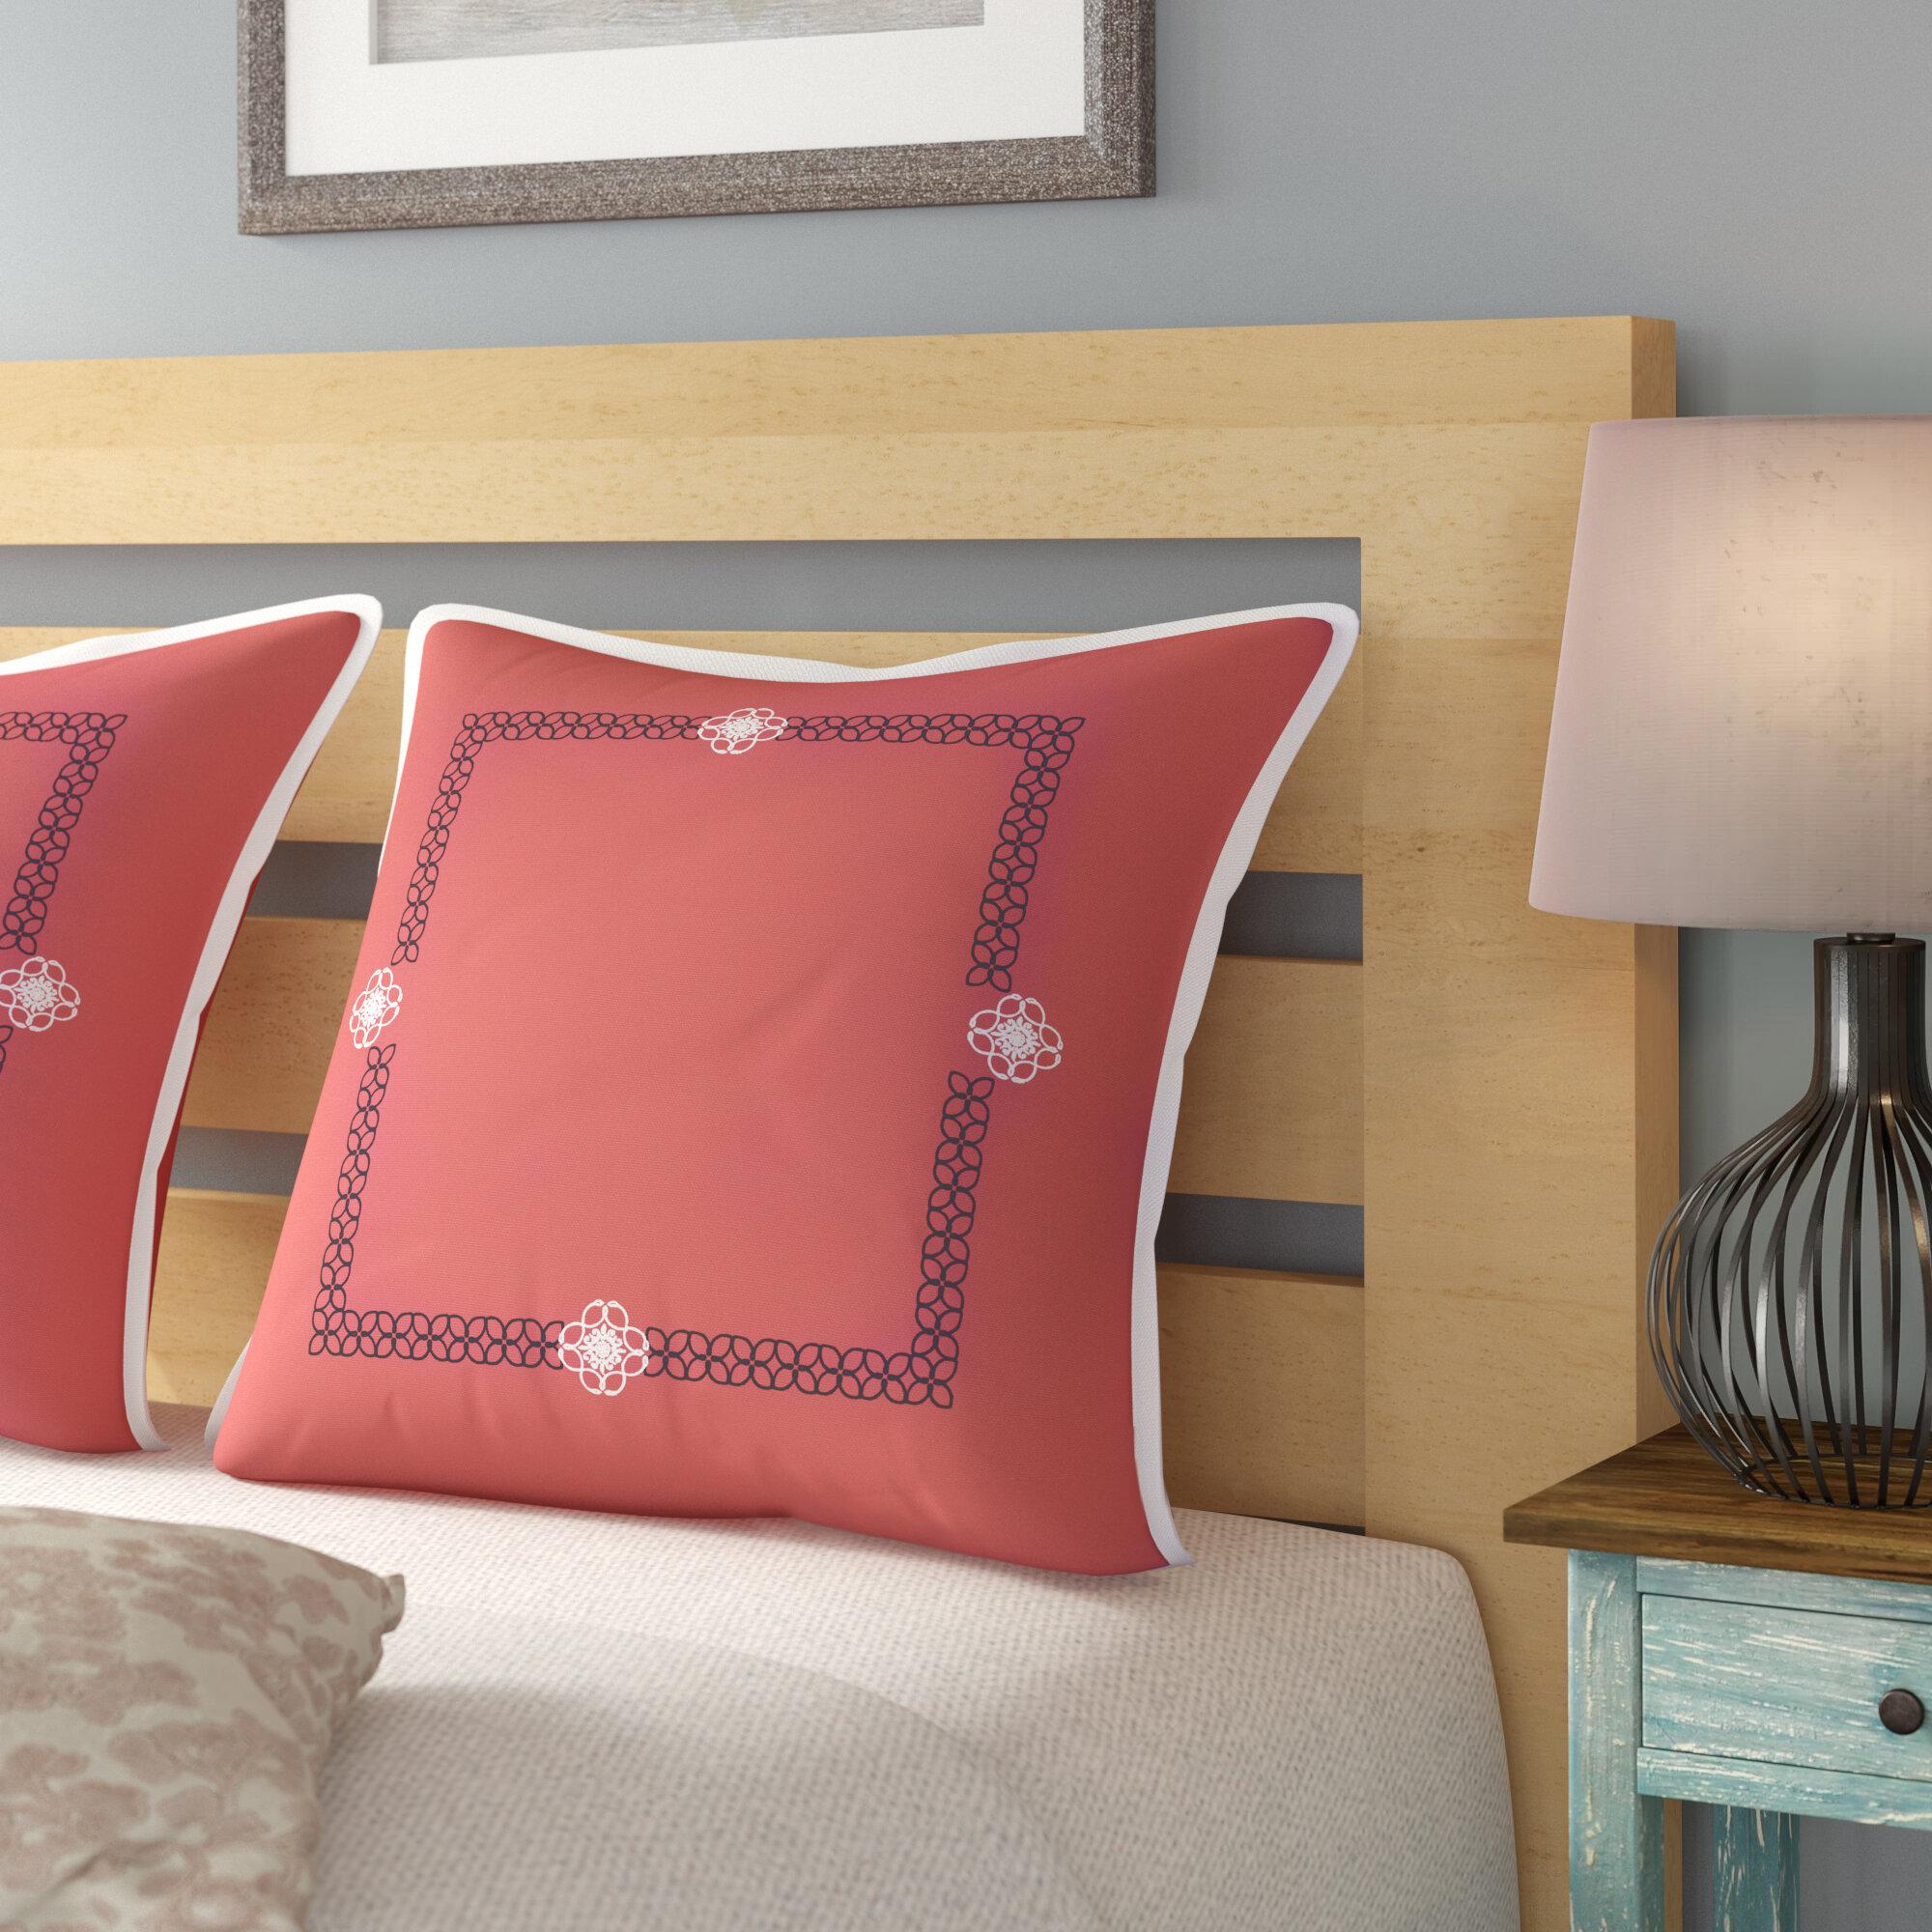 Palomino Throw Pillows You Ll Love In 2021 Wayfair